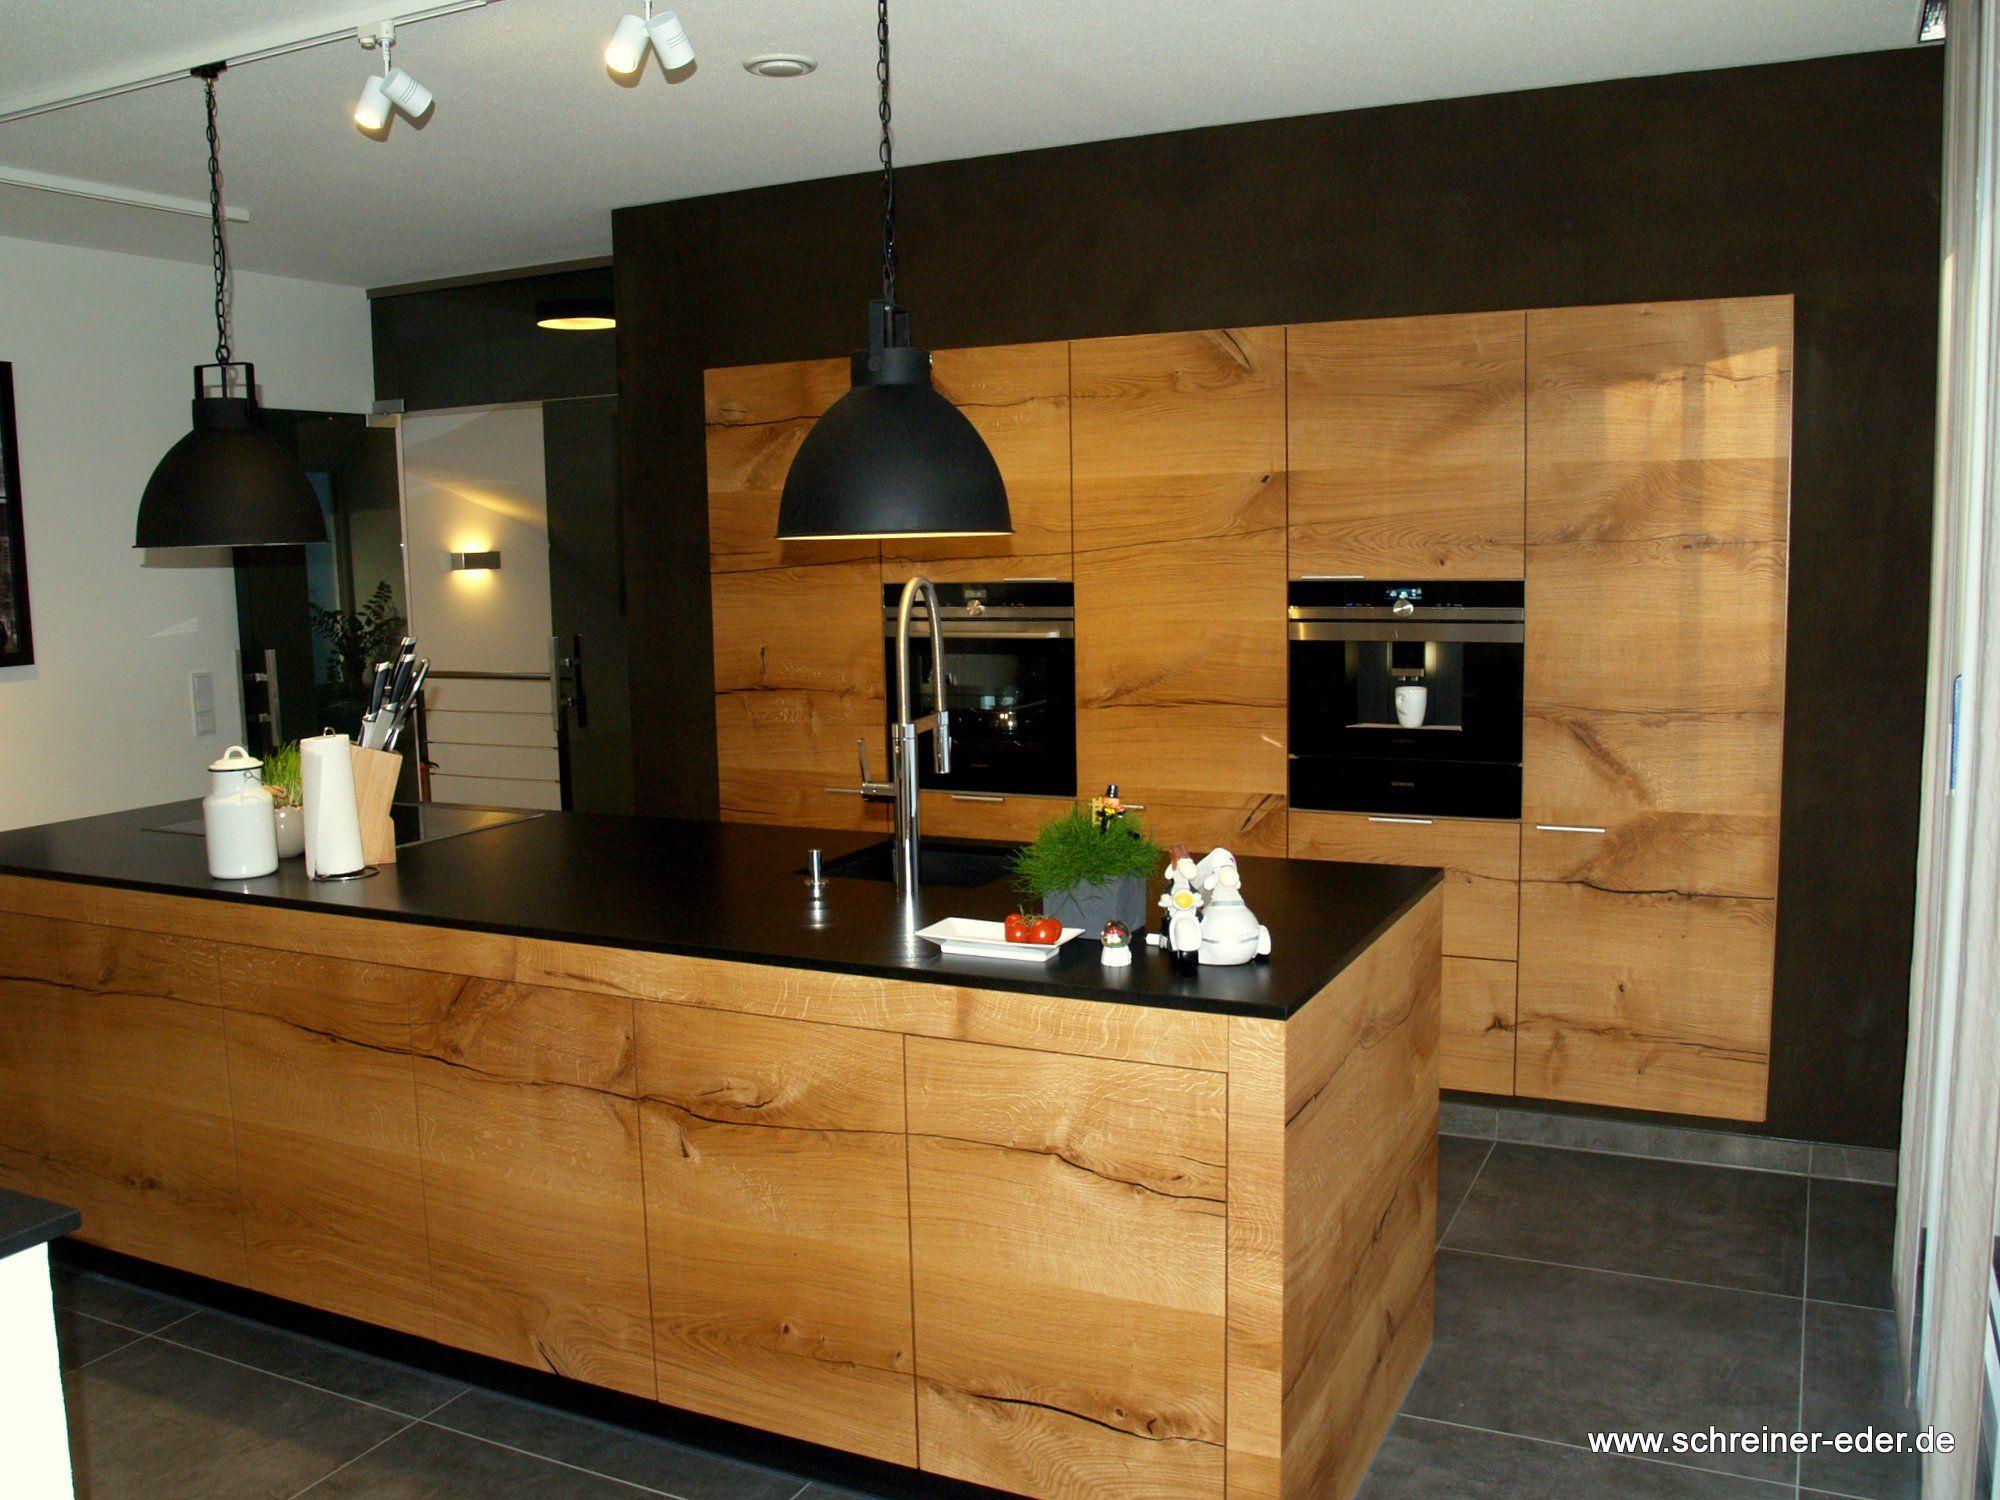 Full Size of Massivholzküchen Abverkauf Moderne Massivholzküche Was Kostet Eine Massivholzküche Massivholzküche Walden Küche Massivholzküche